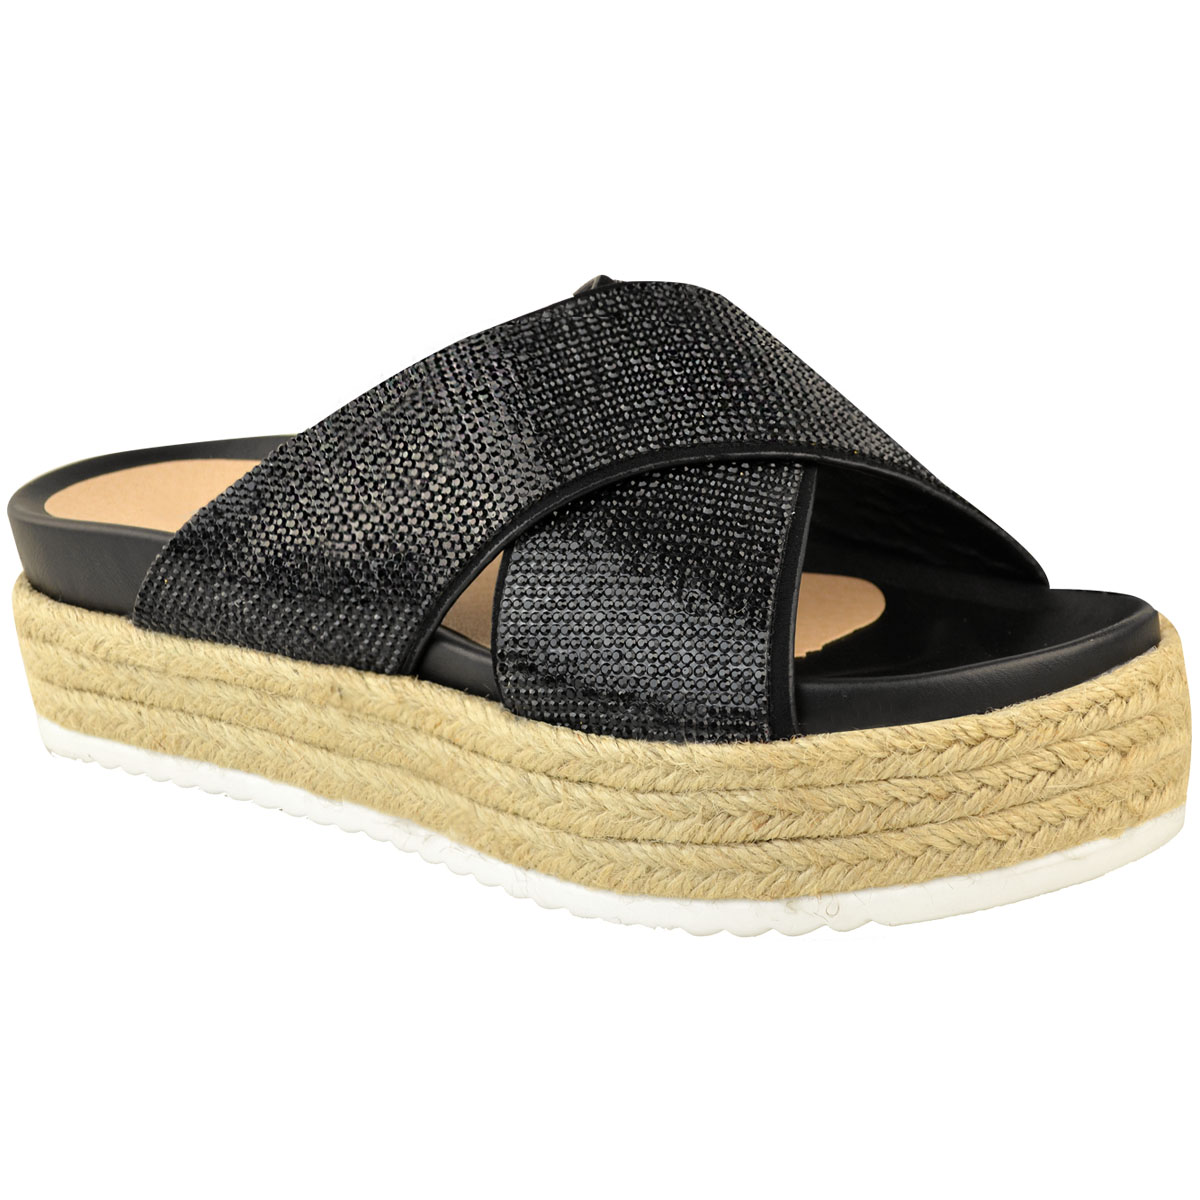 Womens-Ladies-Diamante-Slip-On-Sandals-Flatforms-Sparkly-Platform-Summer-Size-UK thumbnail 3